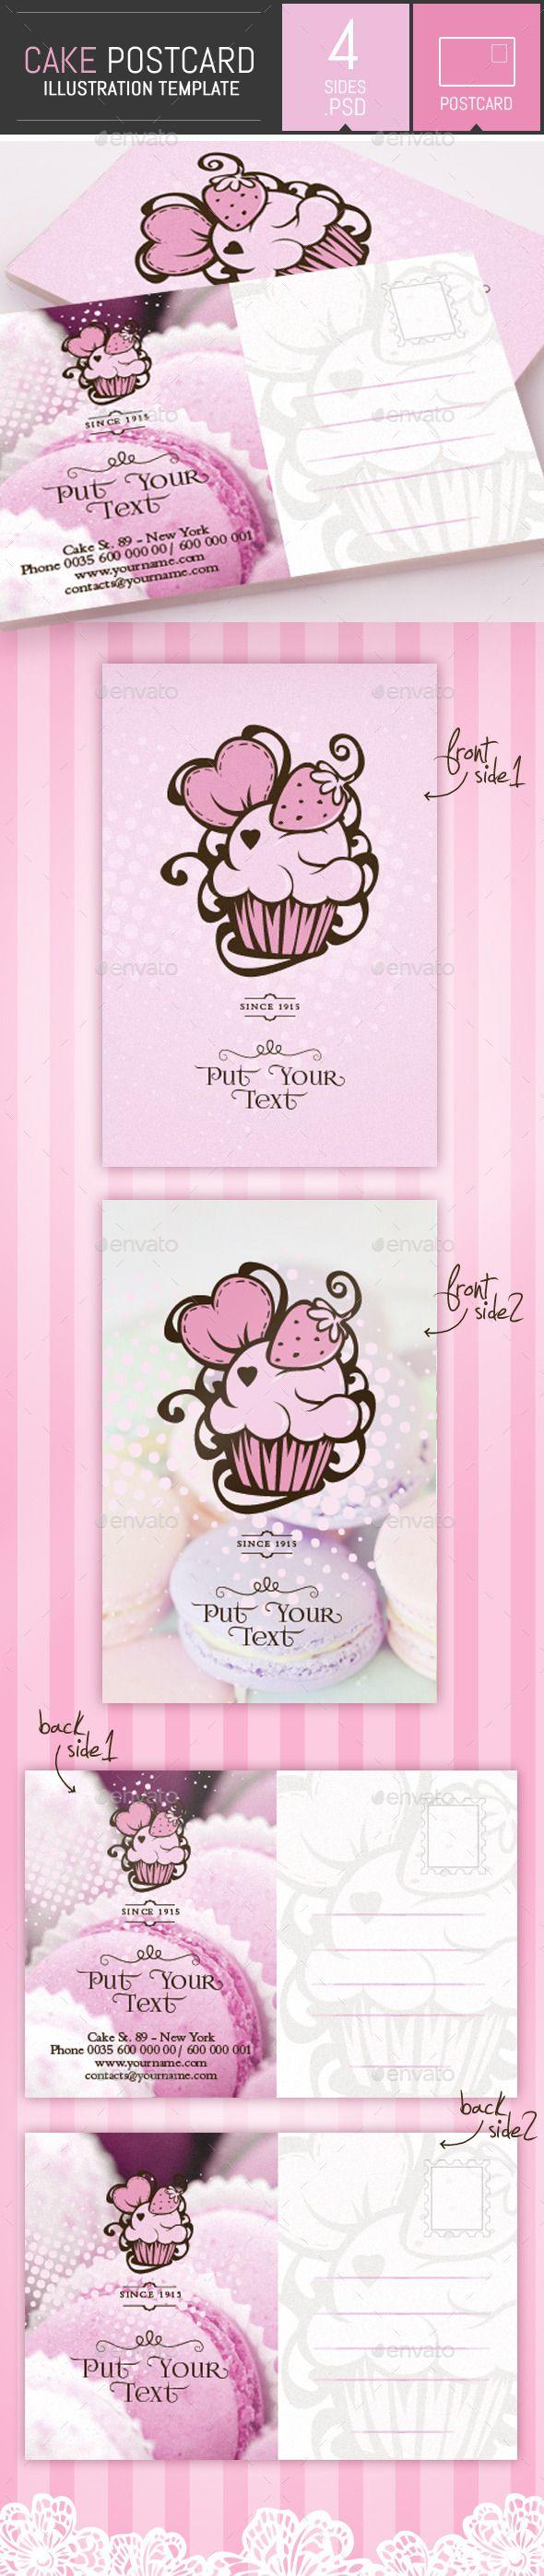 Cake and Cupcake Business Postcard Template